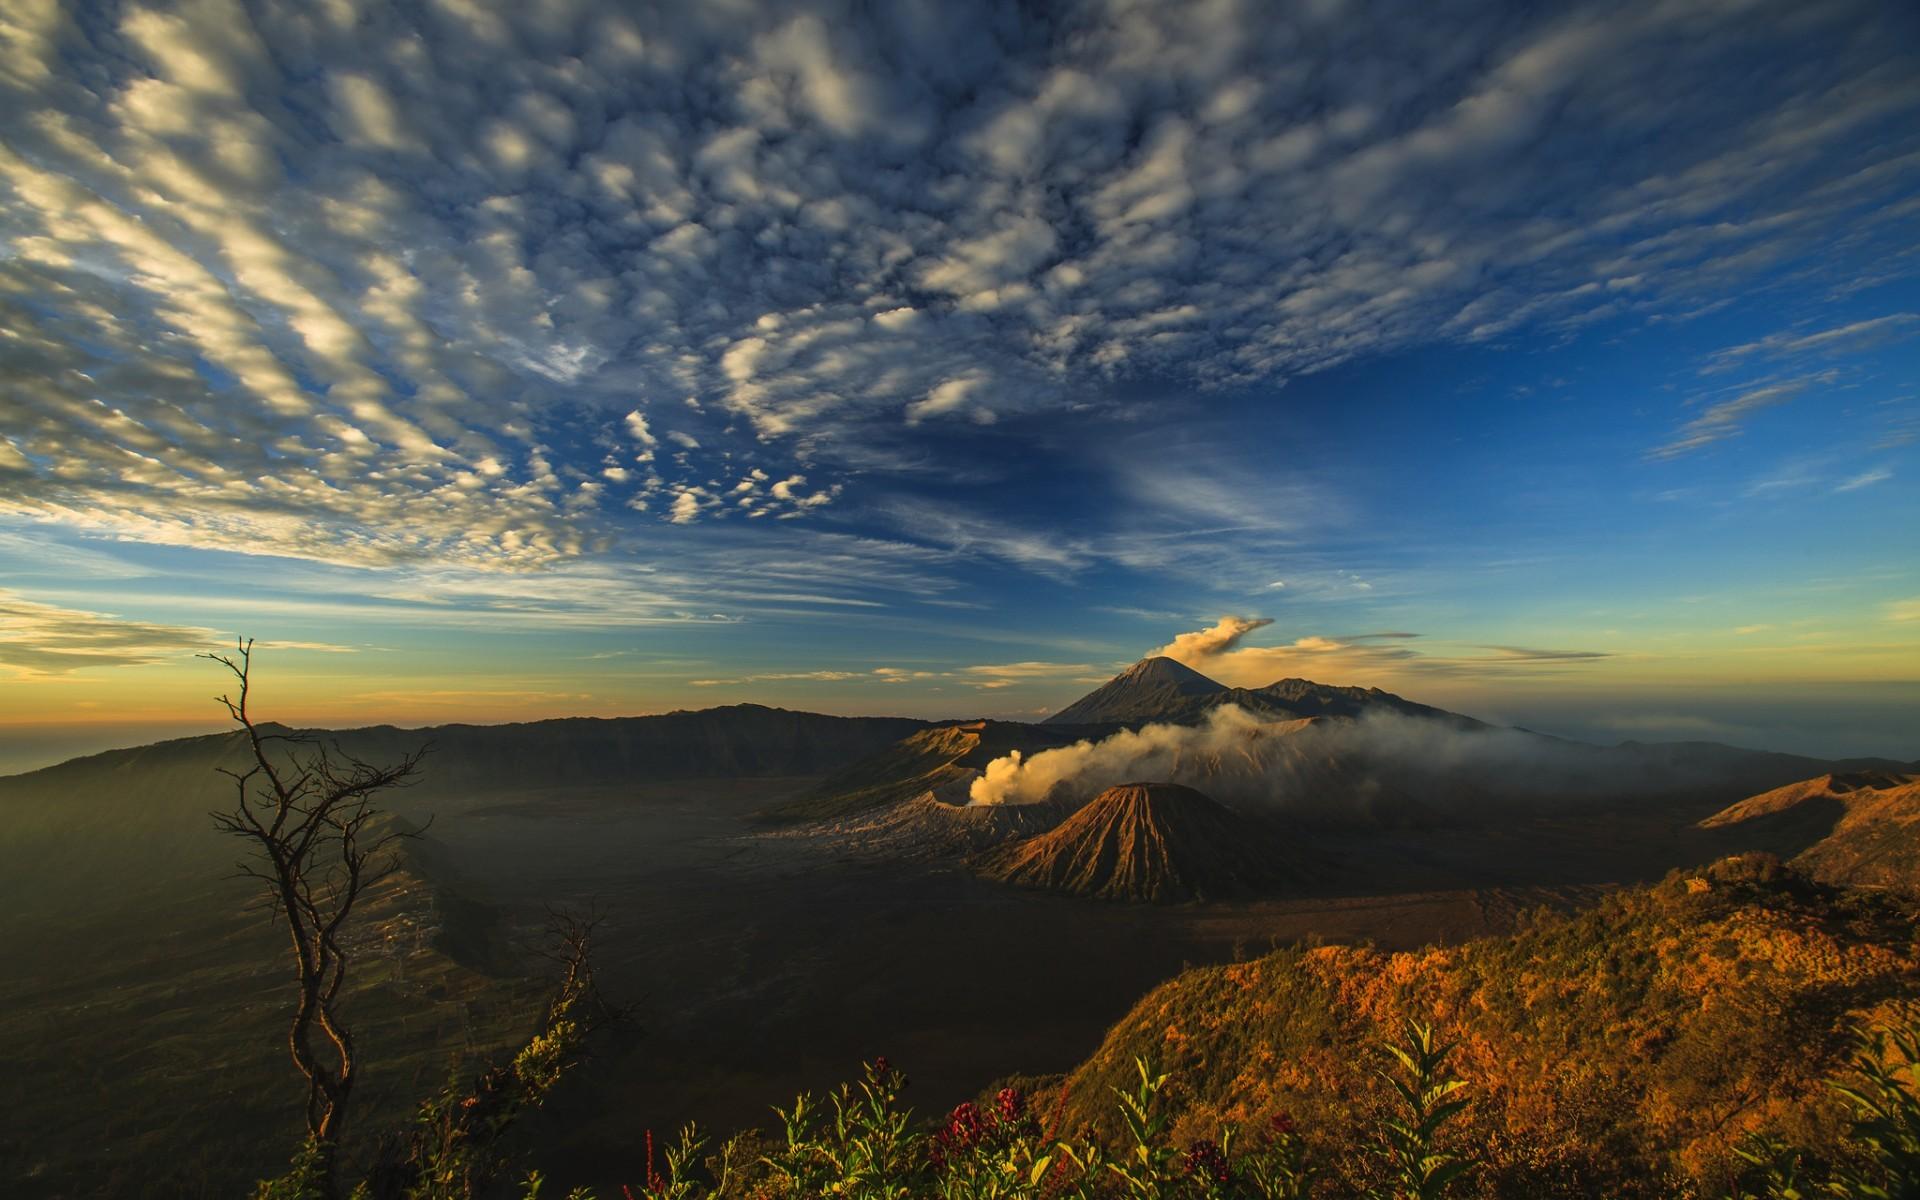 Volcano Smoke Landscape Mt Merapi wallpaper  1920x1200  121106  WallpaperUP